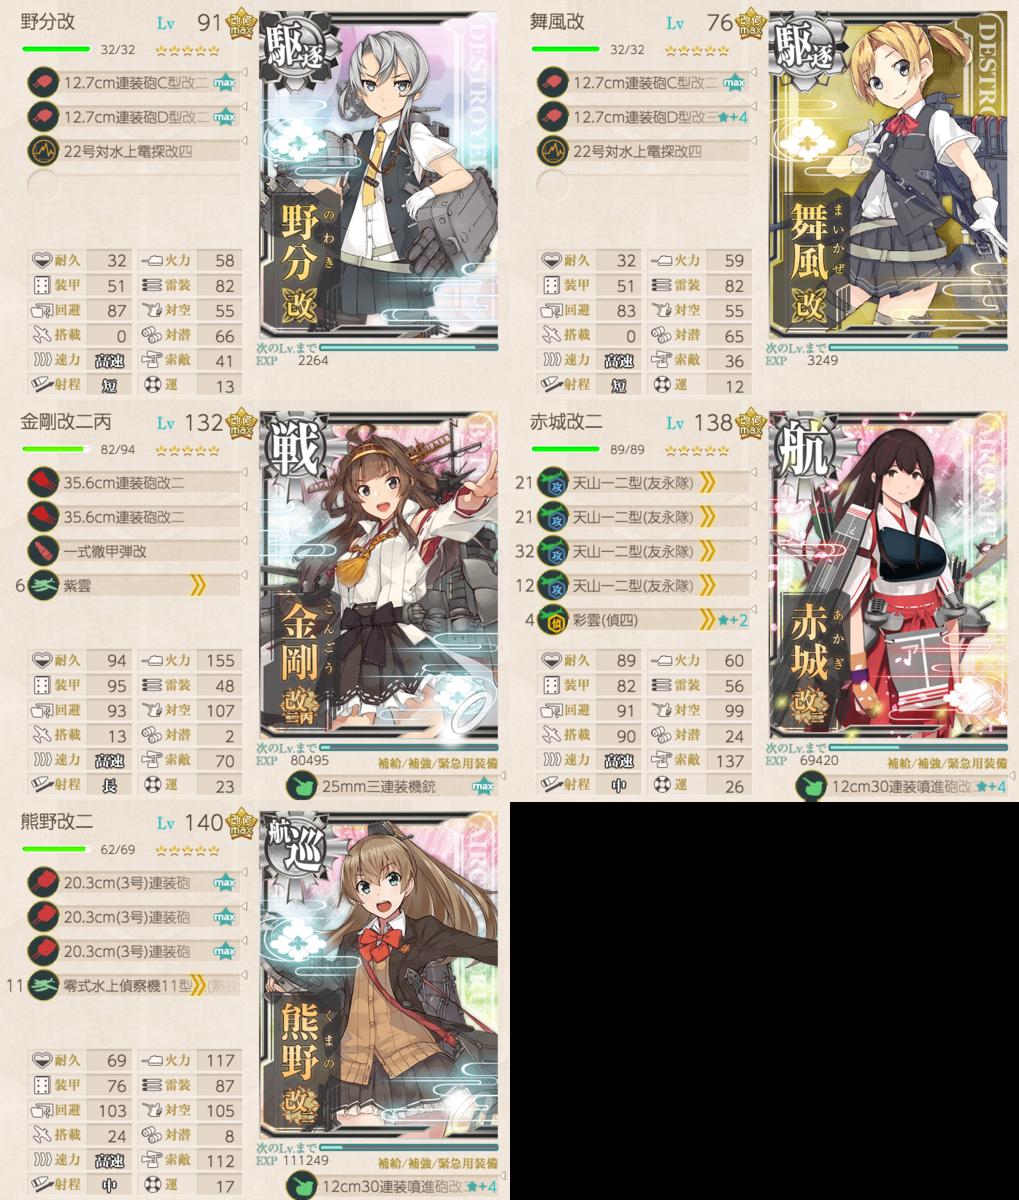 f:id:nameless_admiral:20201019132459p:plain